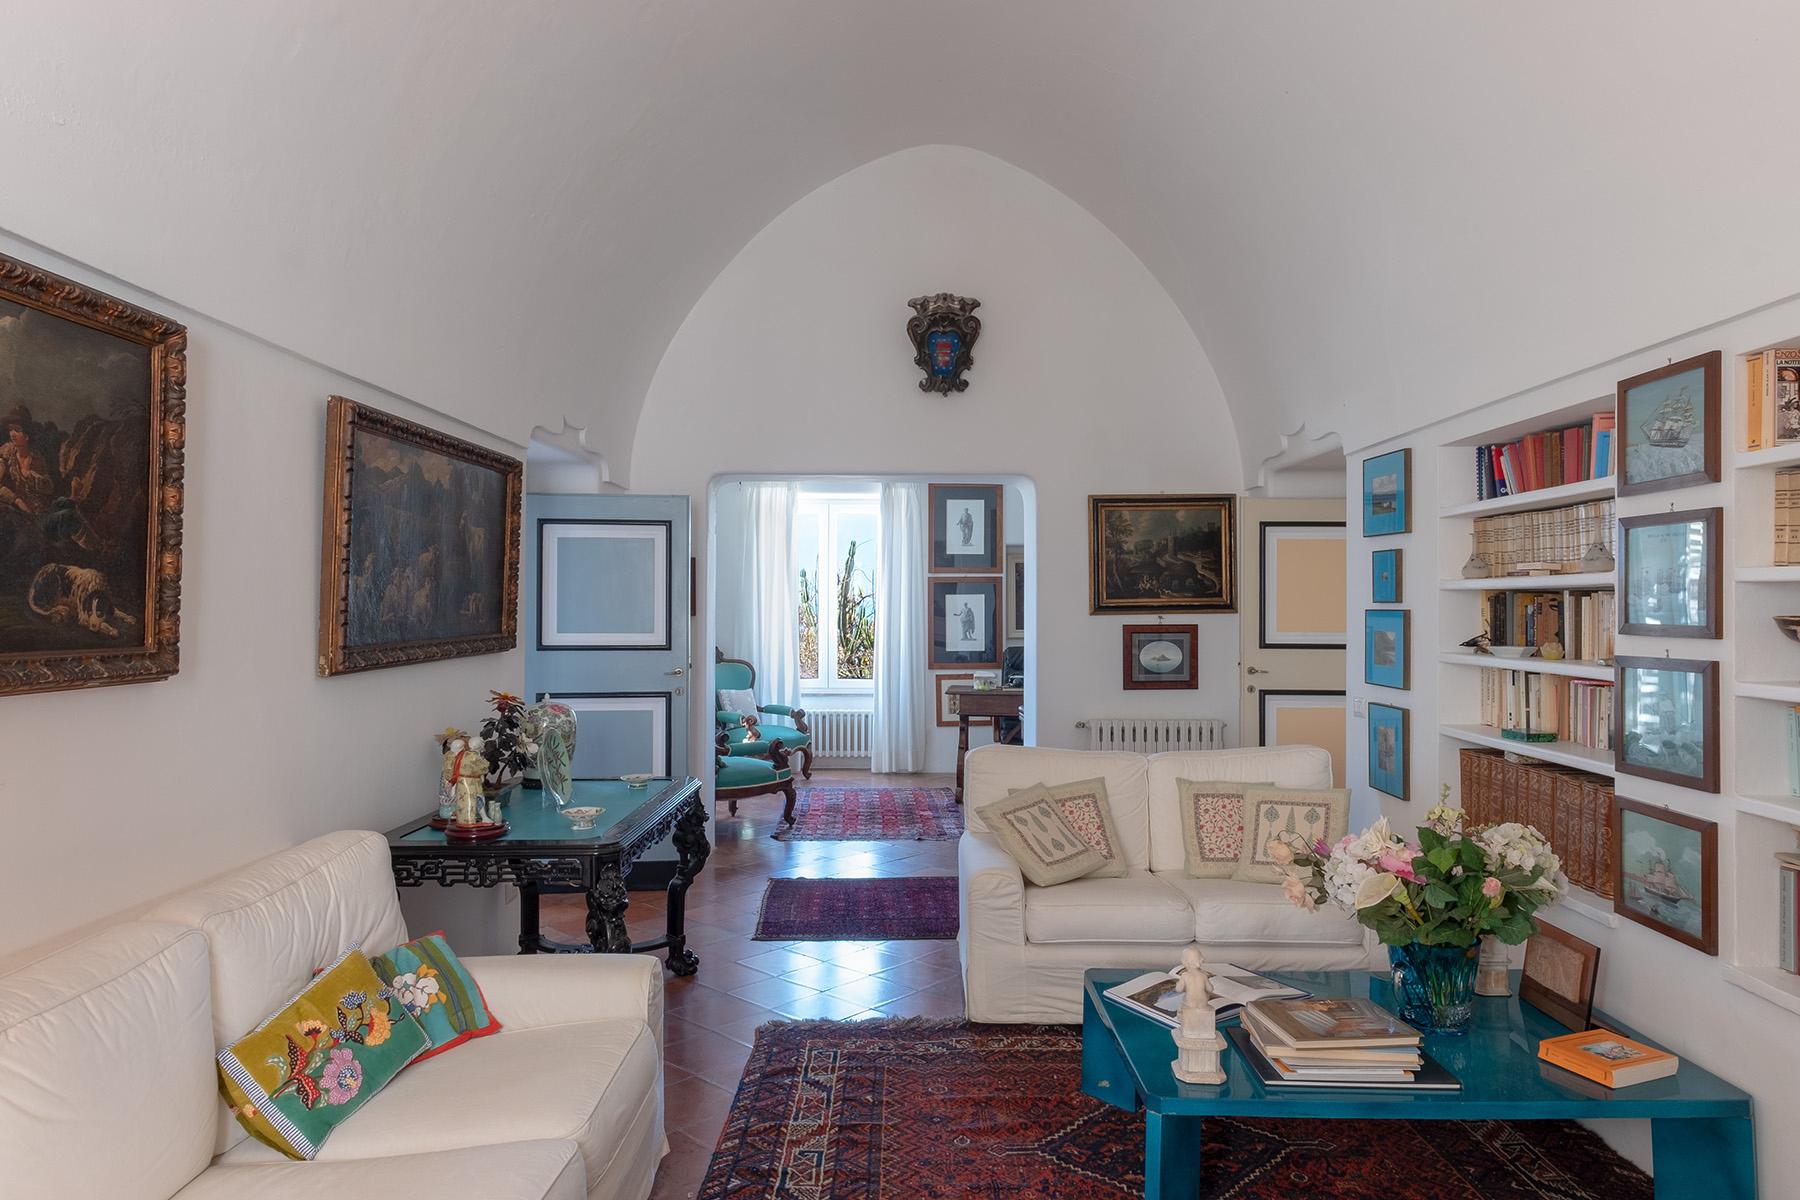 Casa indipendente in Vendita a Capri: 5 locali, 300 mq - Foto 15